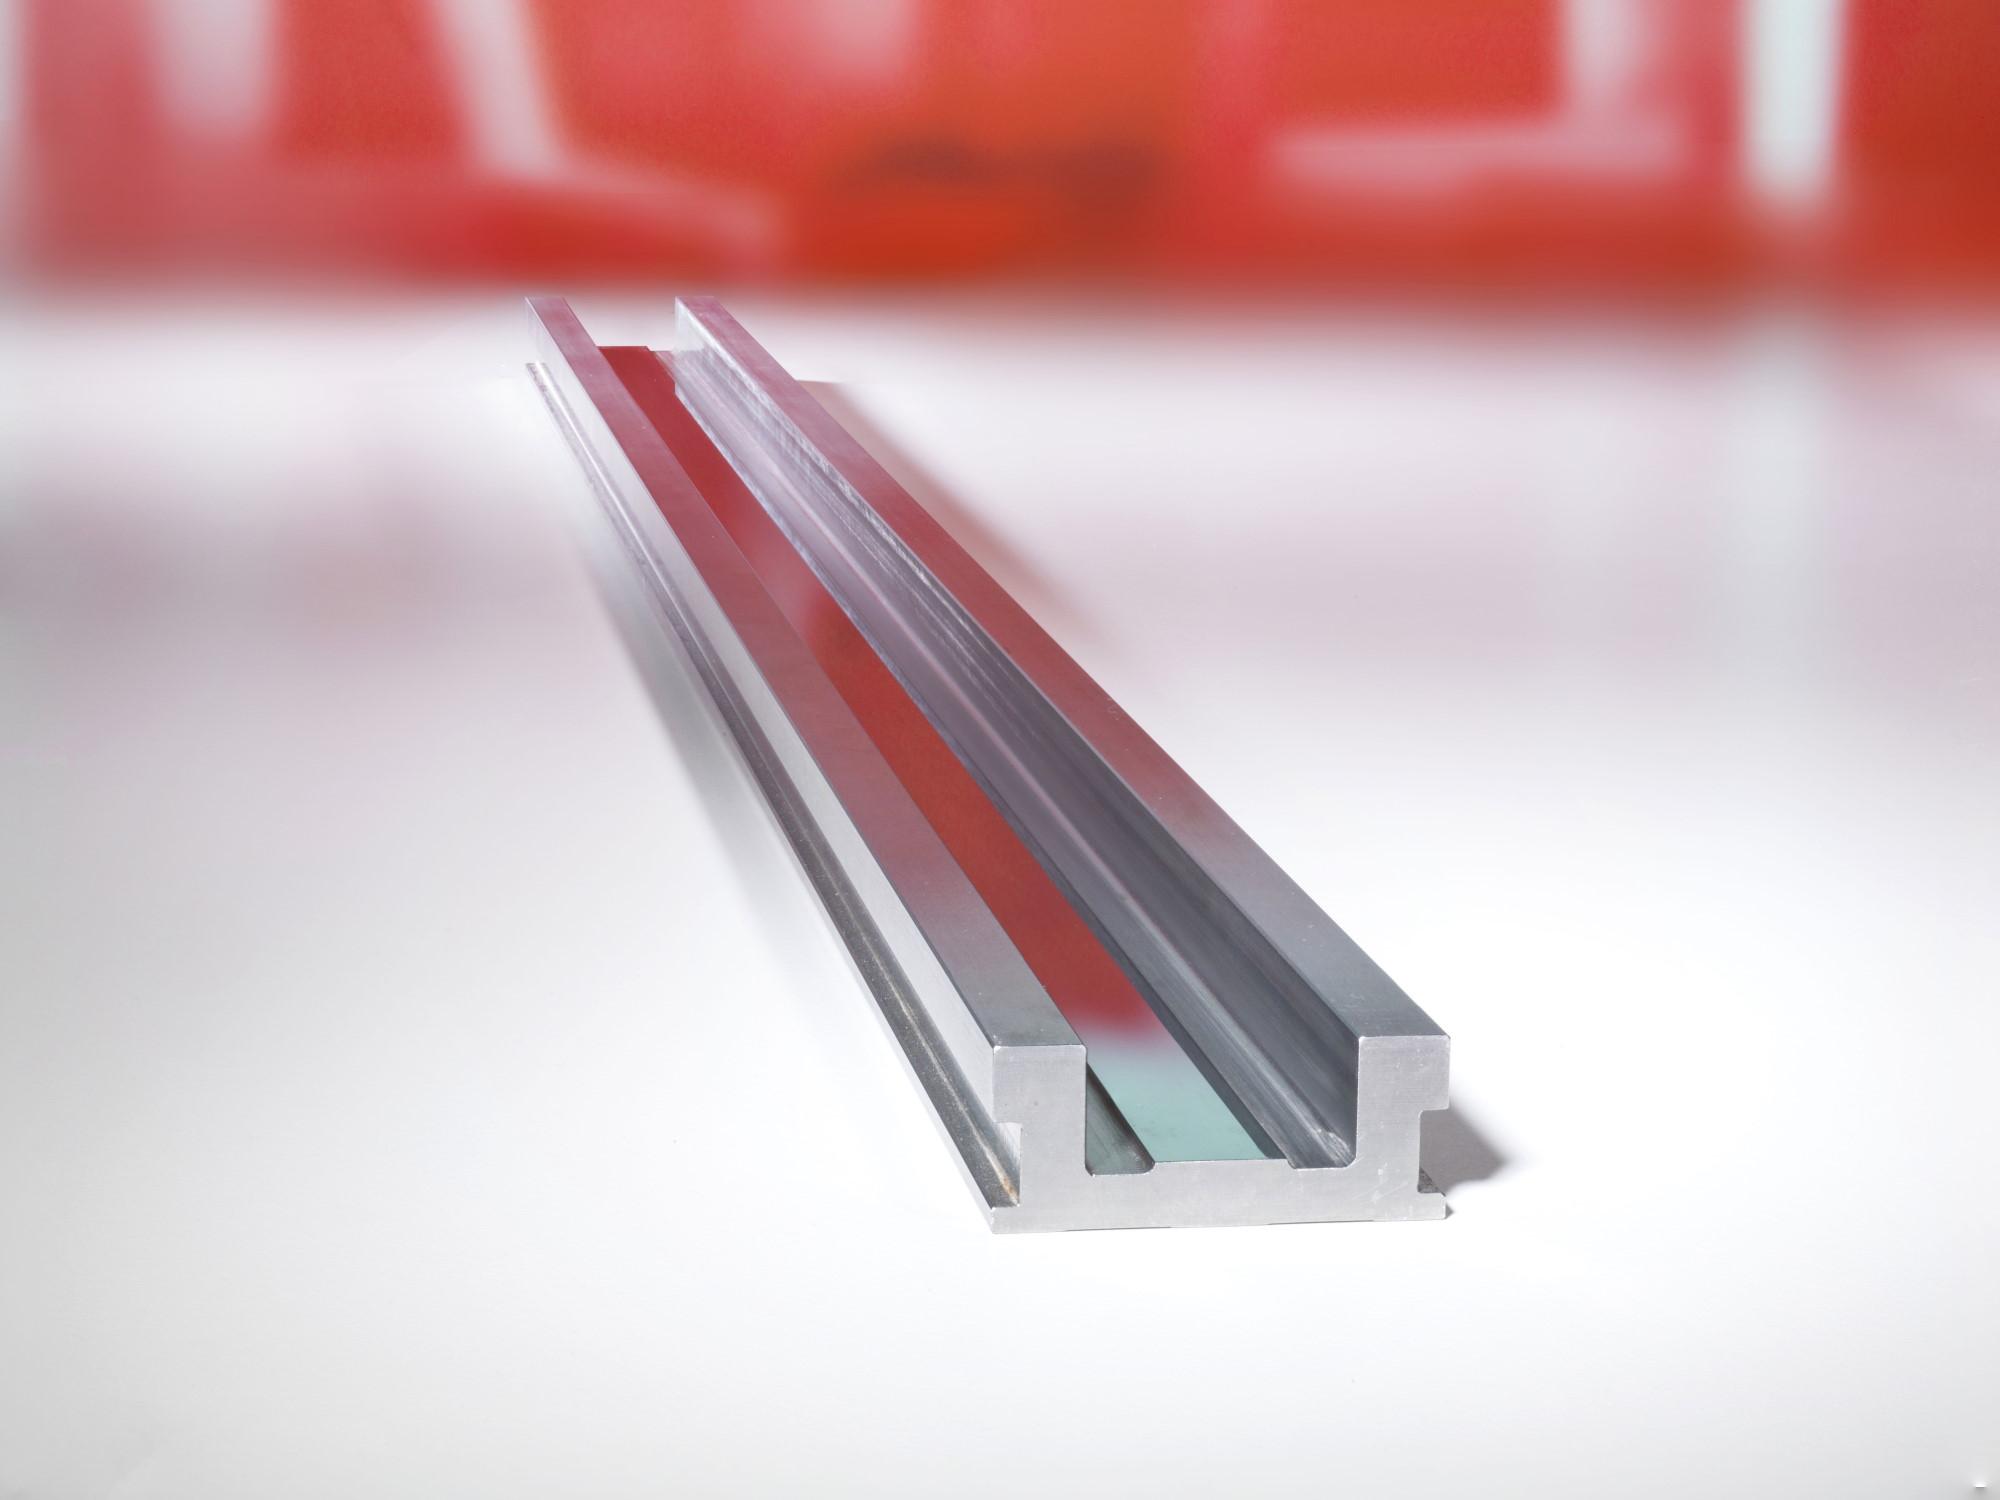 Präzisionsprofile - Högg AG Produktionstechnik